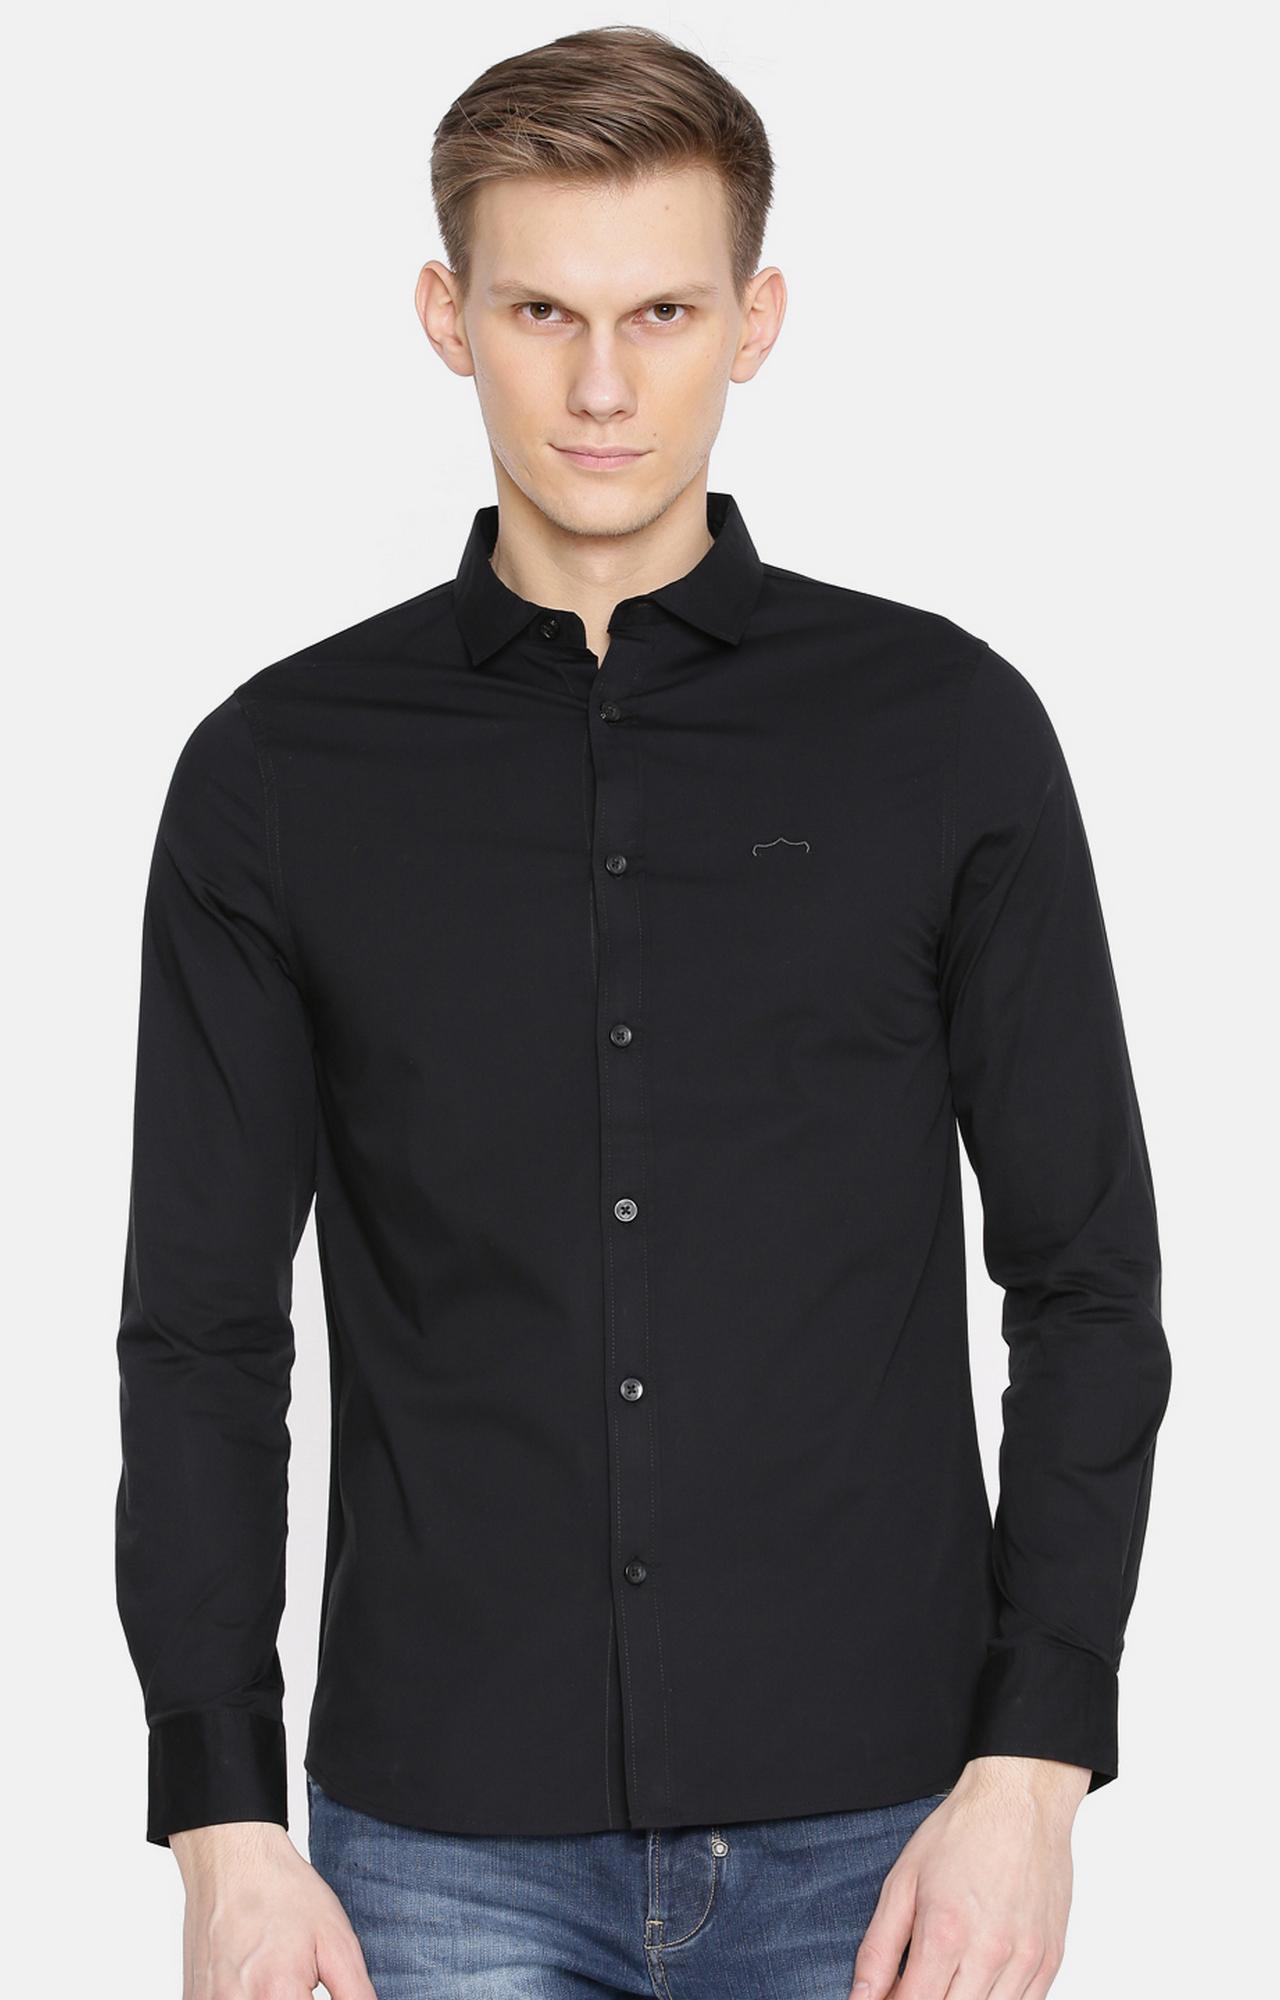 883 Police | Black Melange Casual Shirt